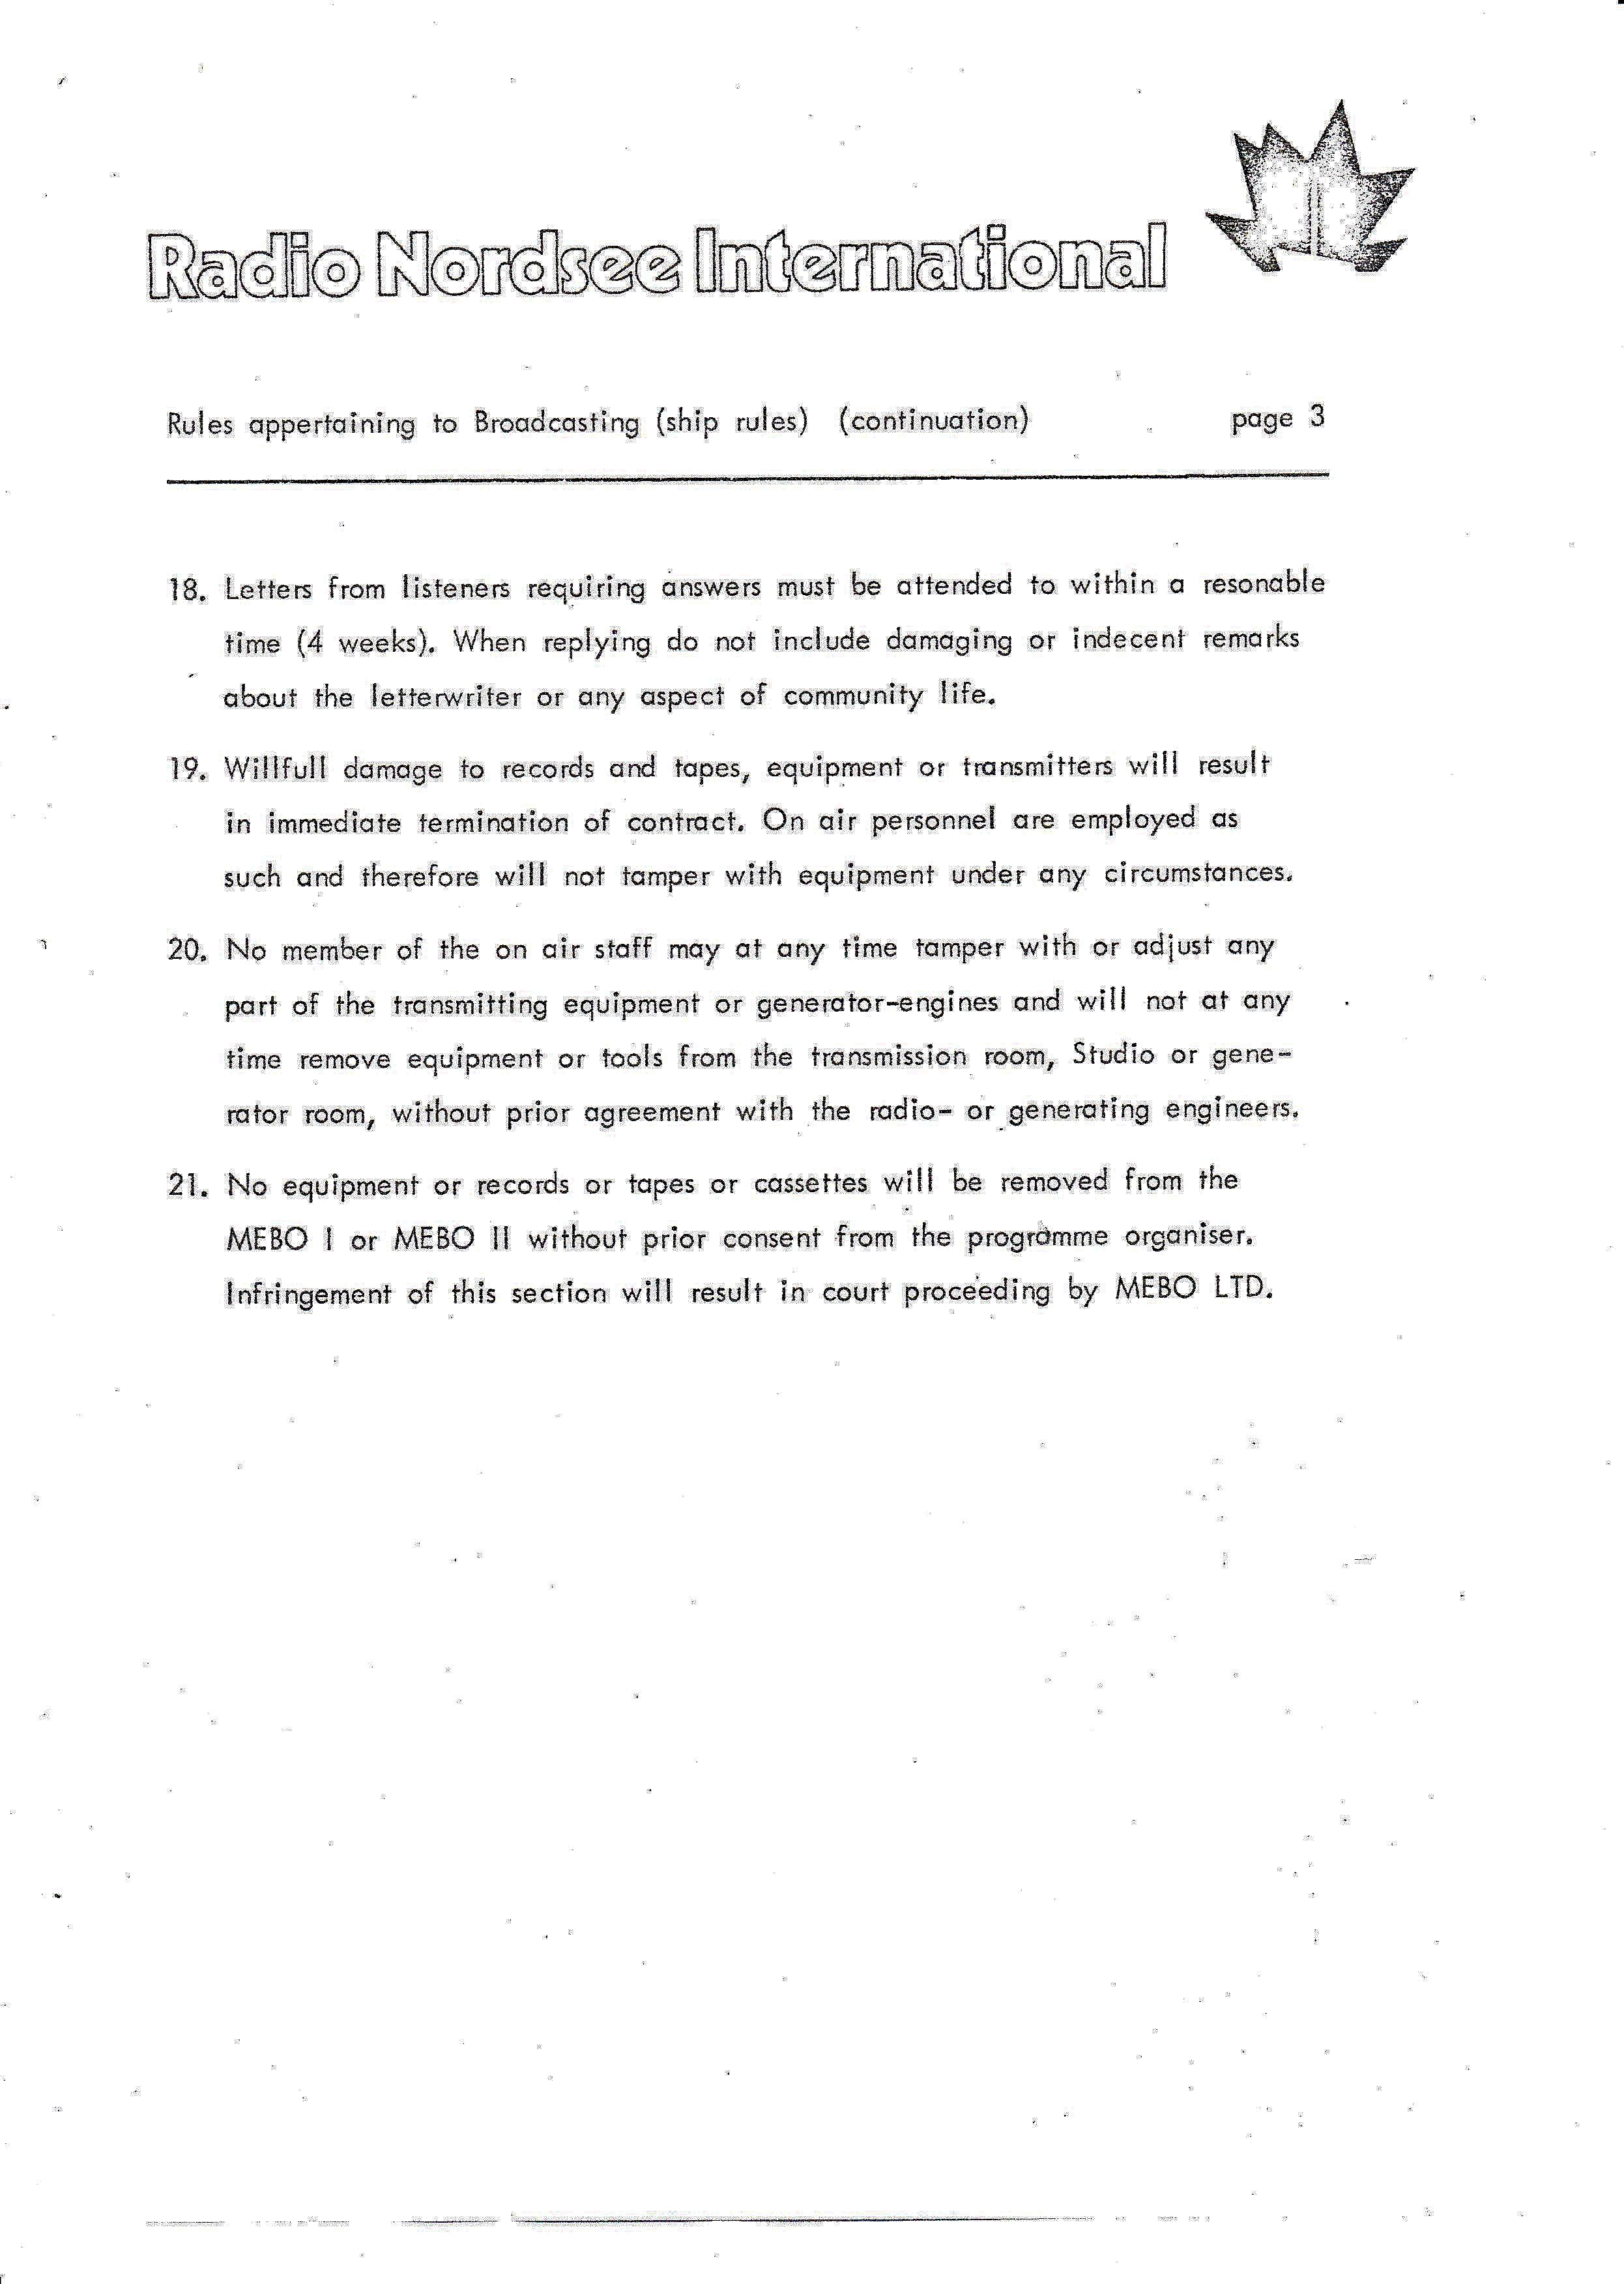 RNI Rules P3-2